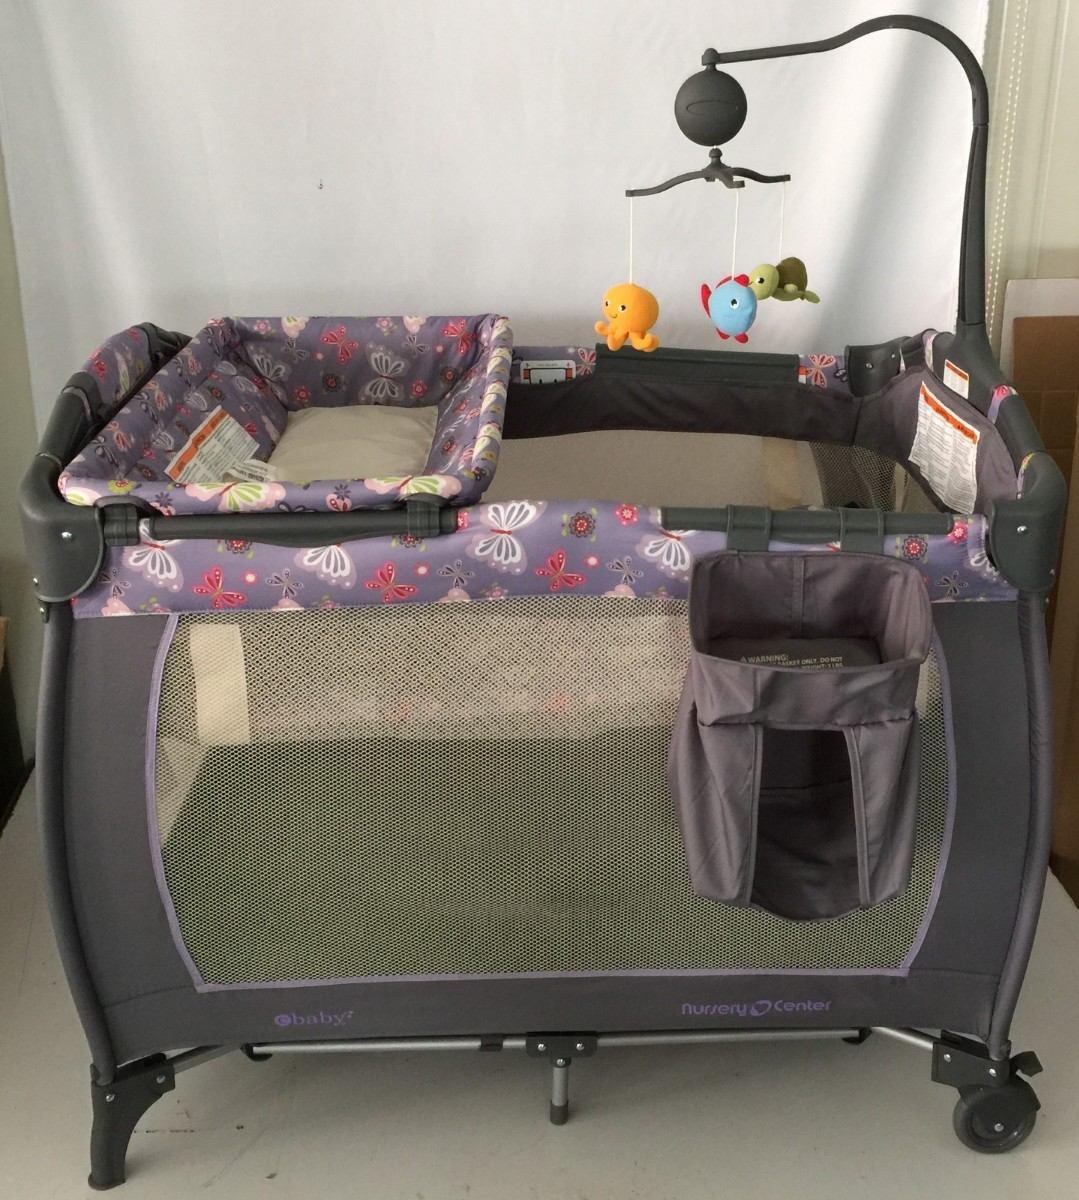 Cuna Corral Bebe E Baby Nuevo S 360 00 En Mercado Libre